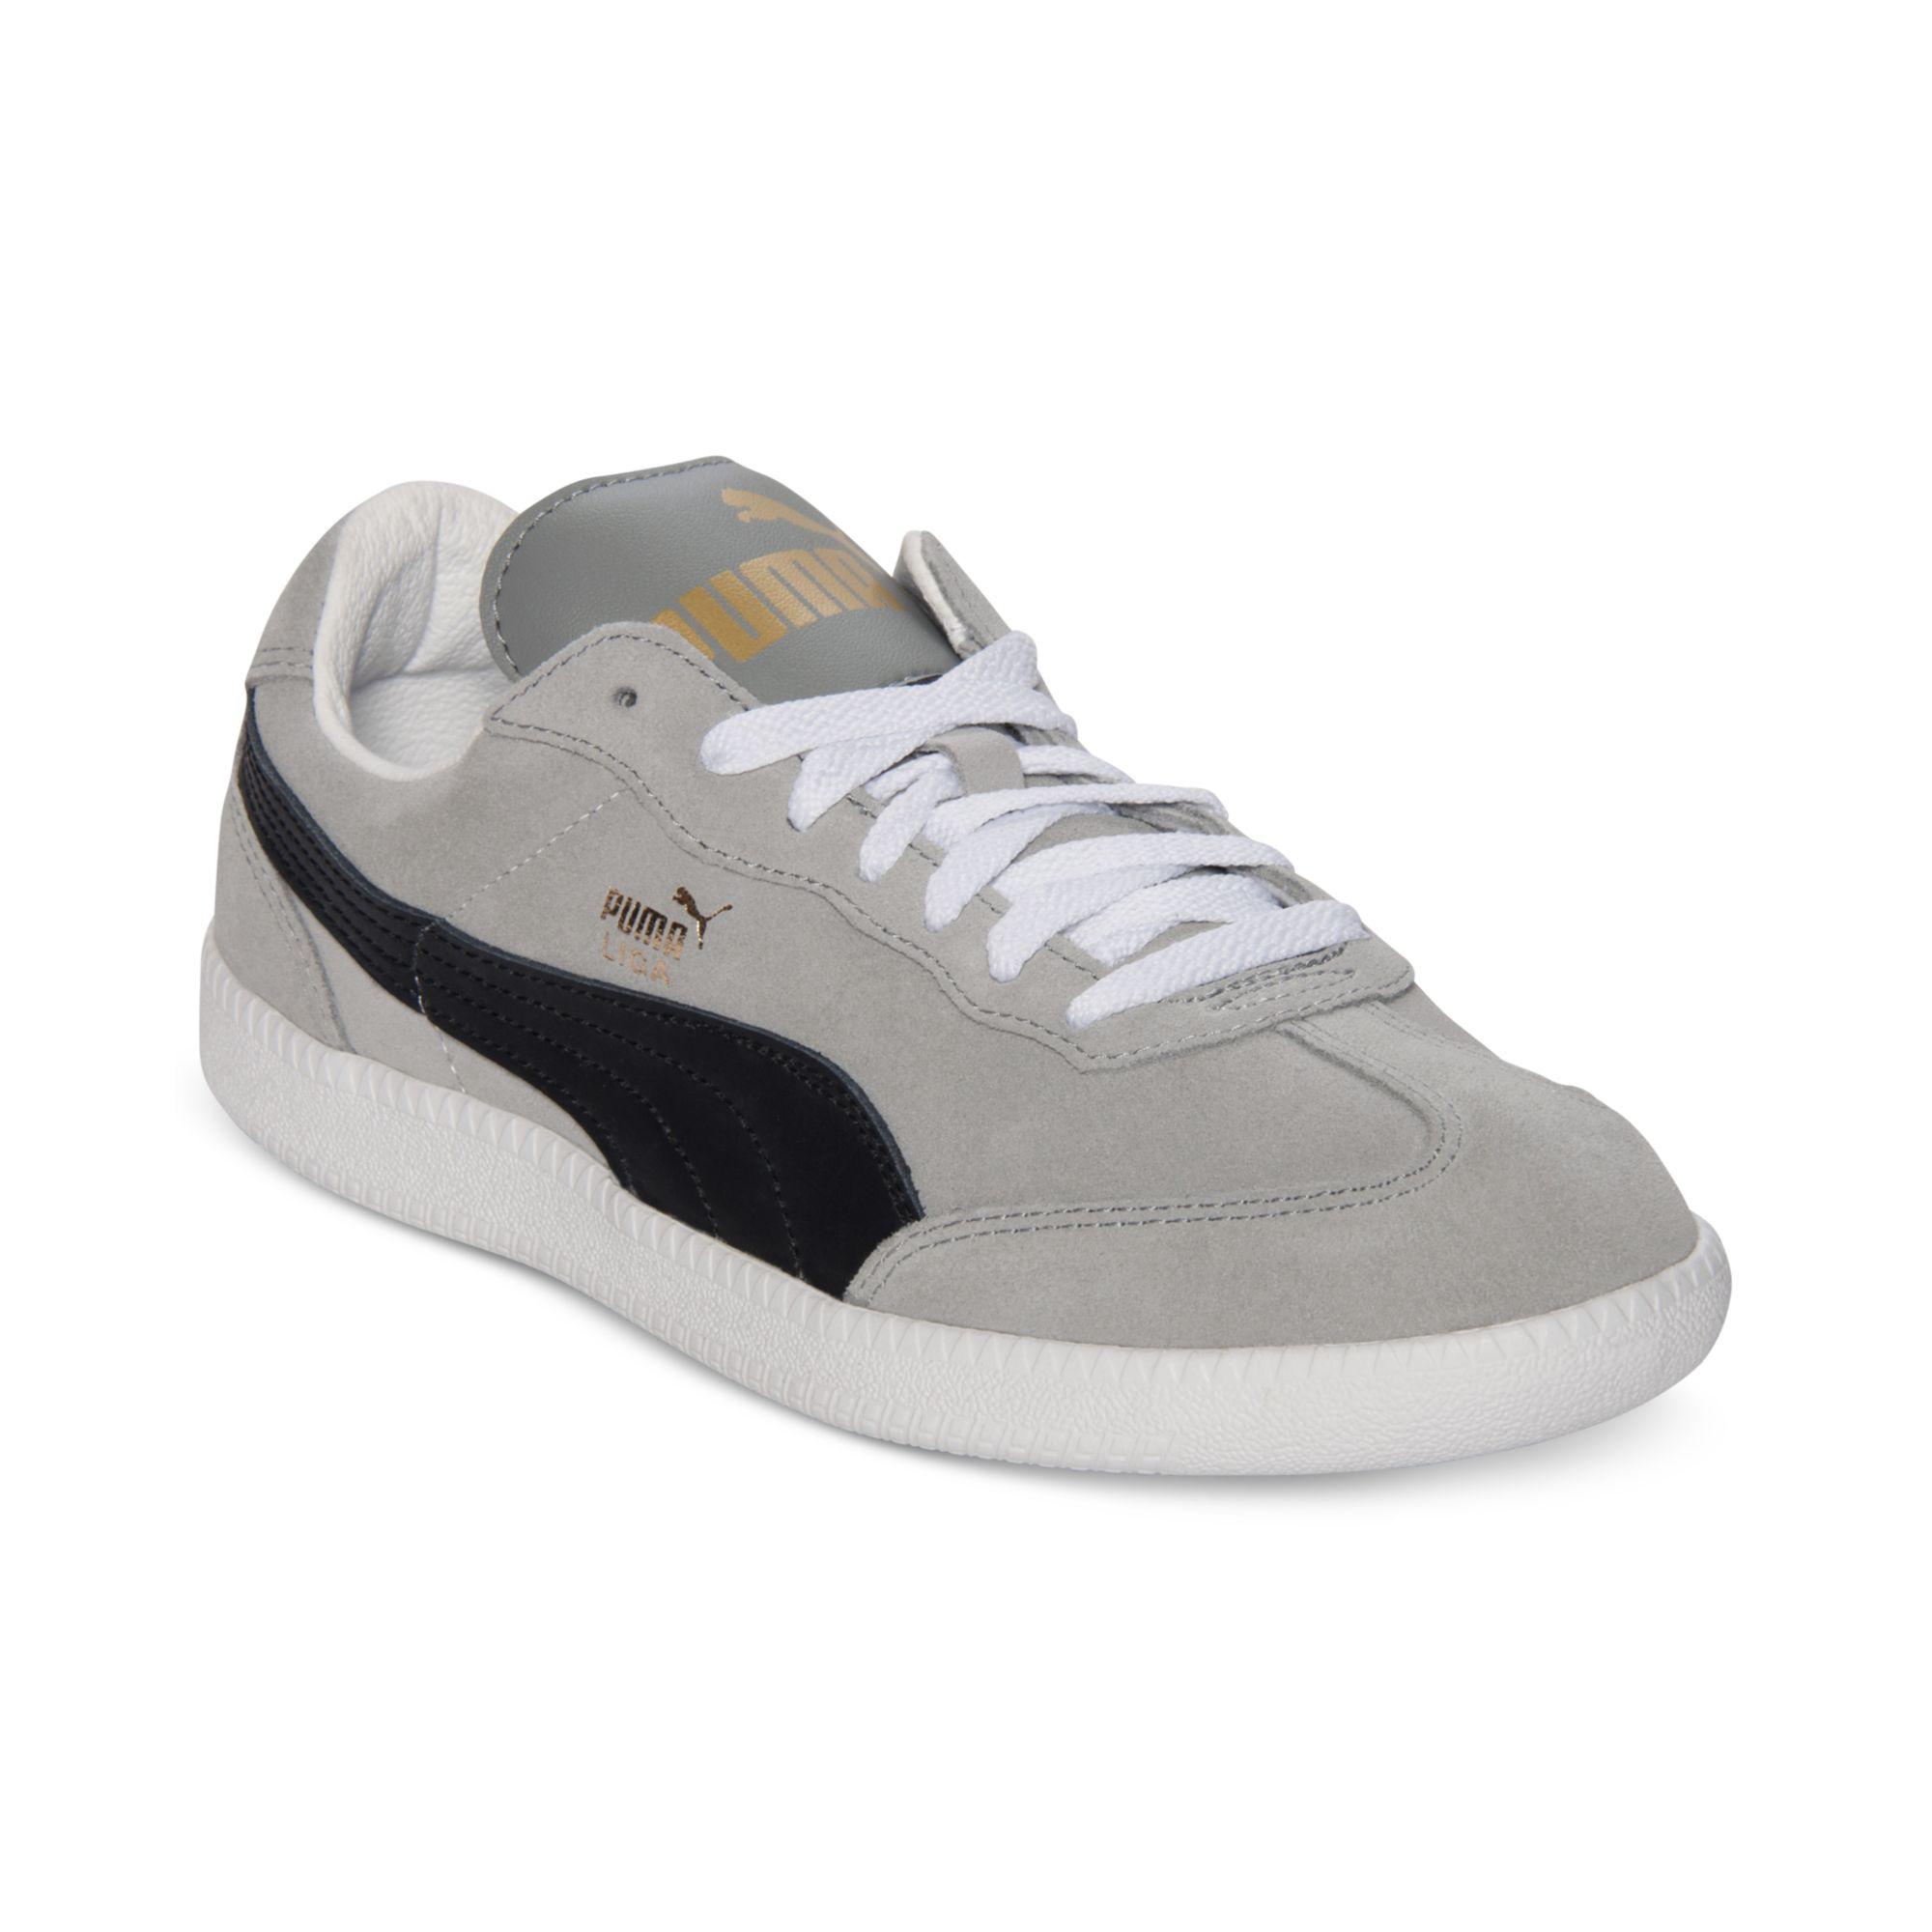 Liga Suede- Grey/Black sneakers